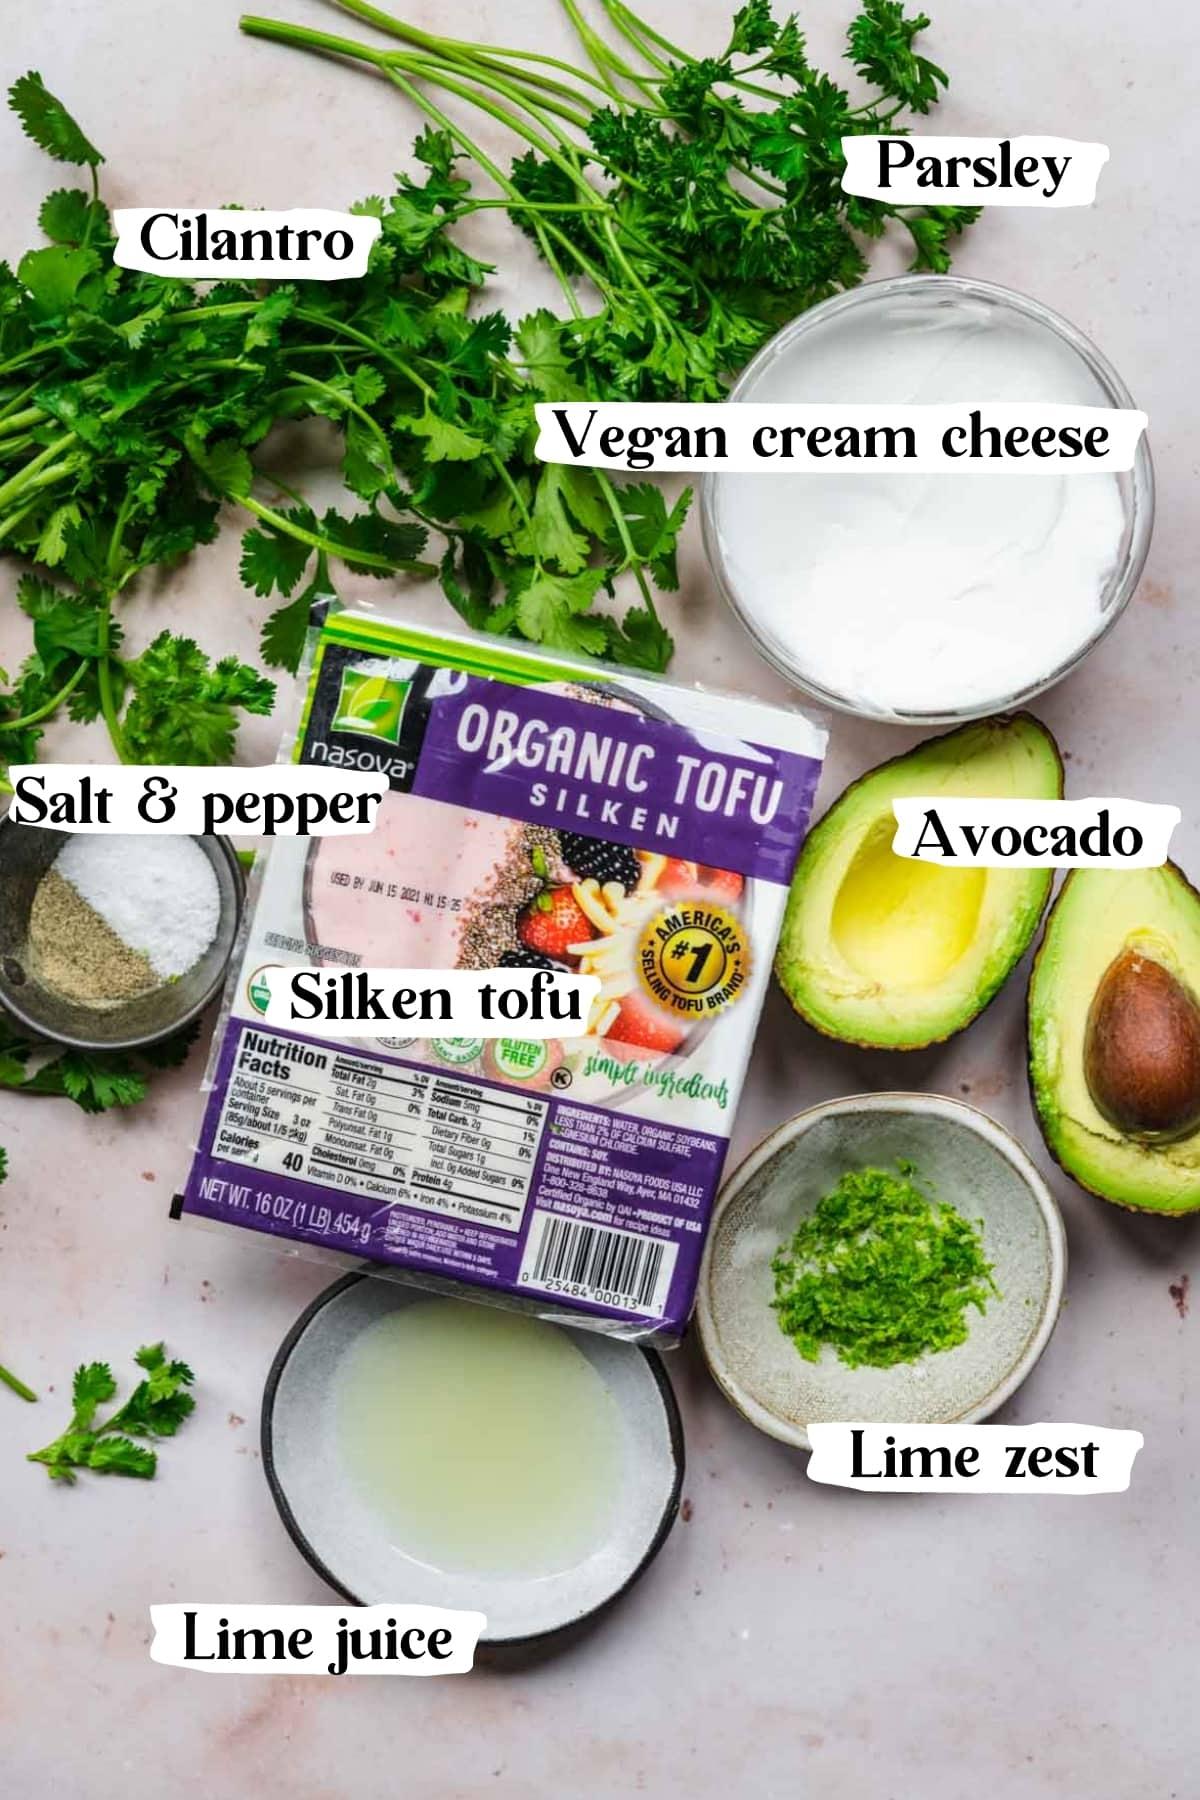 overhead view of ingredients for herb tofu dip.